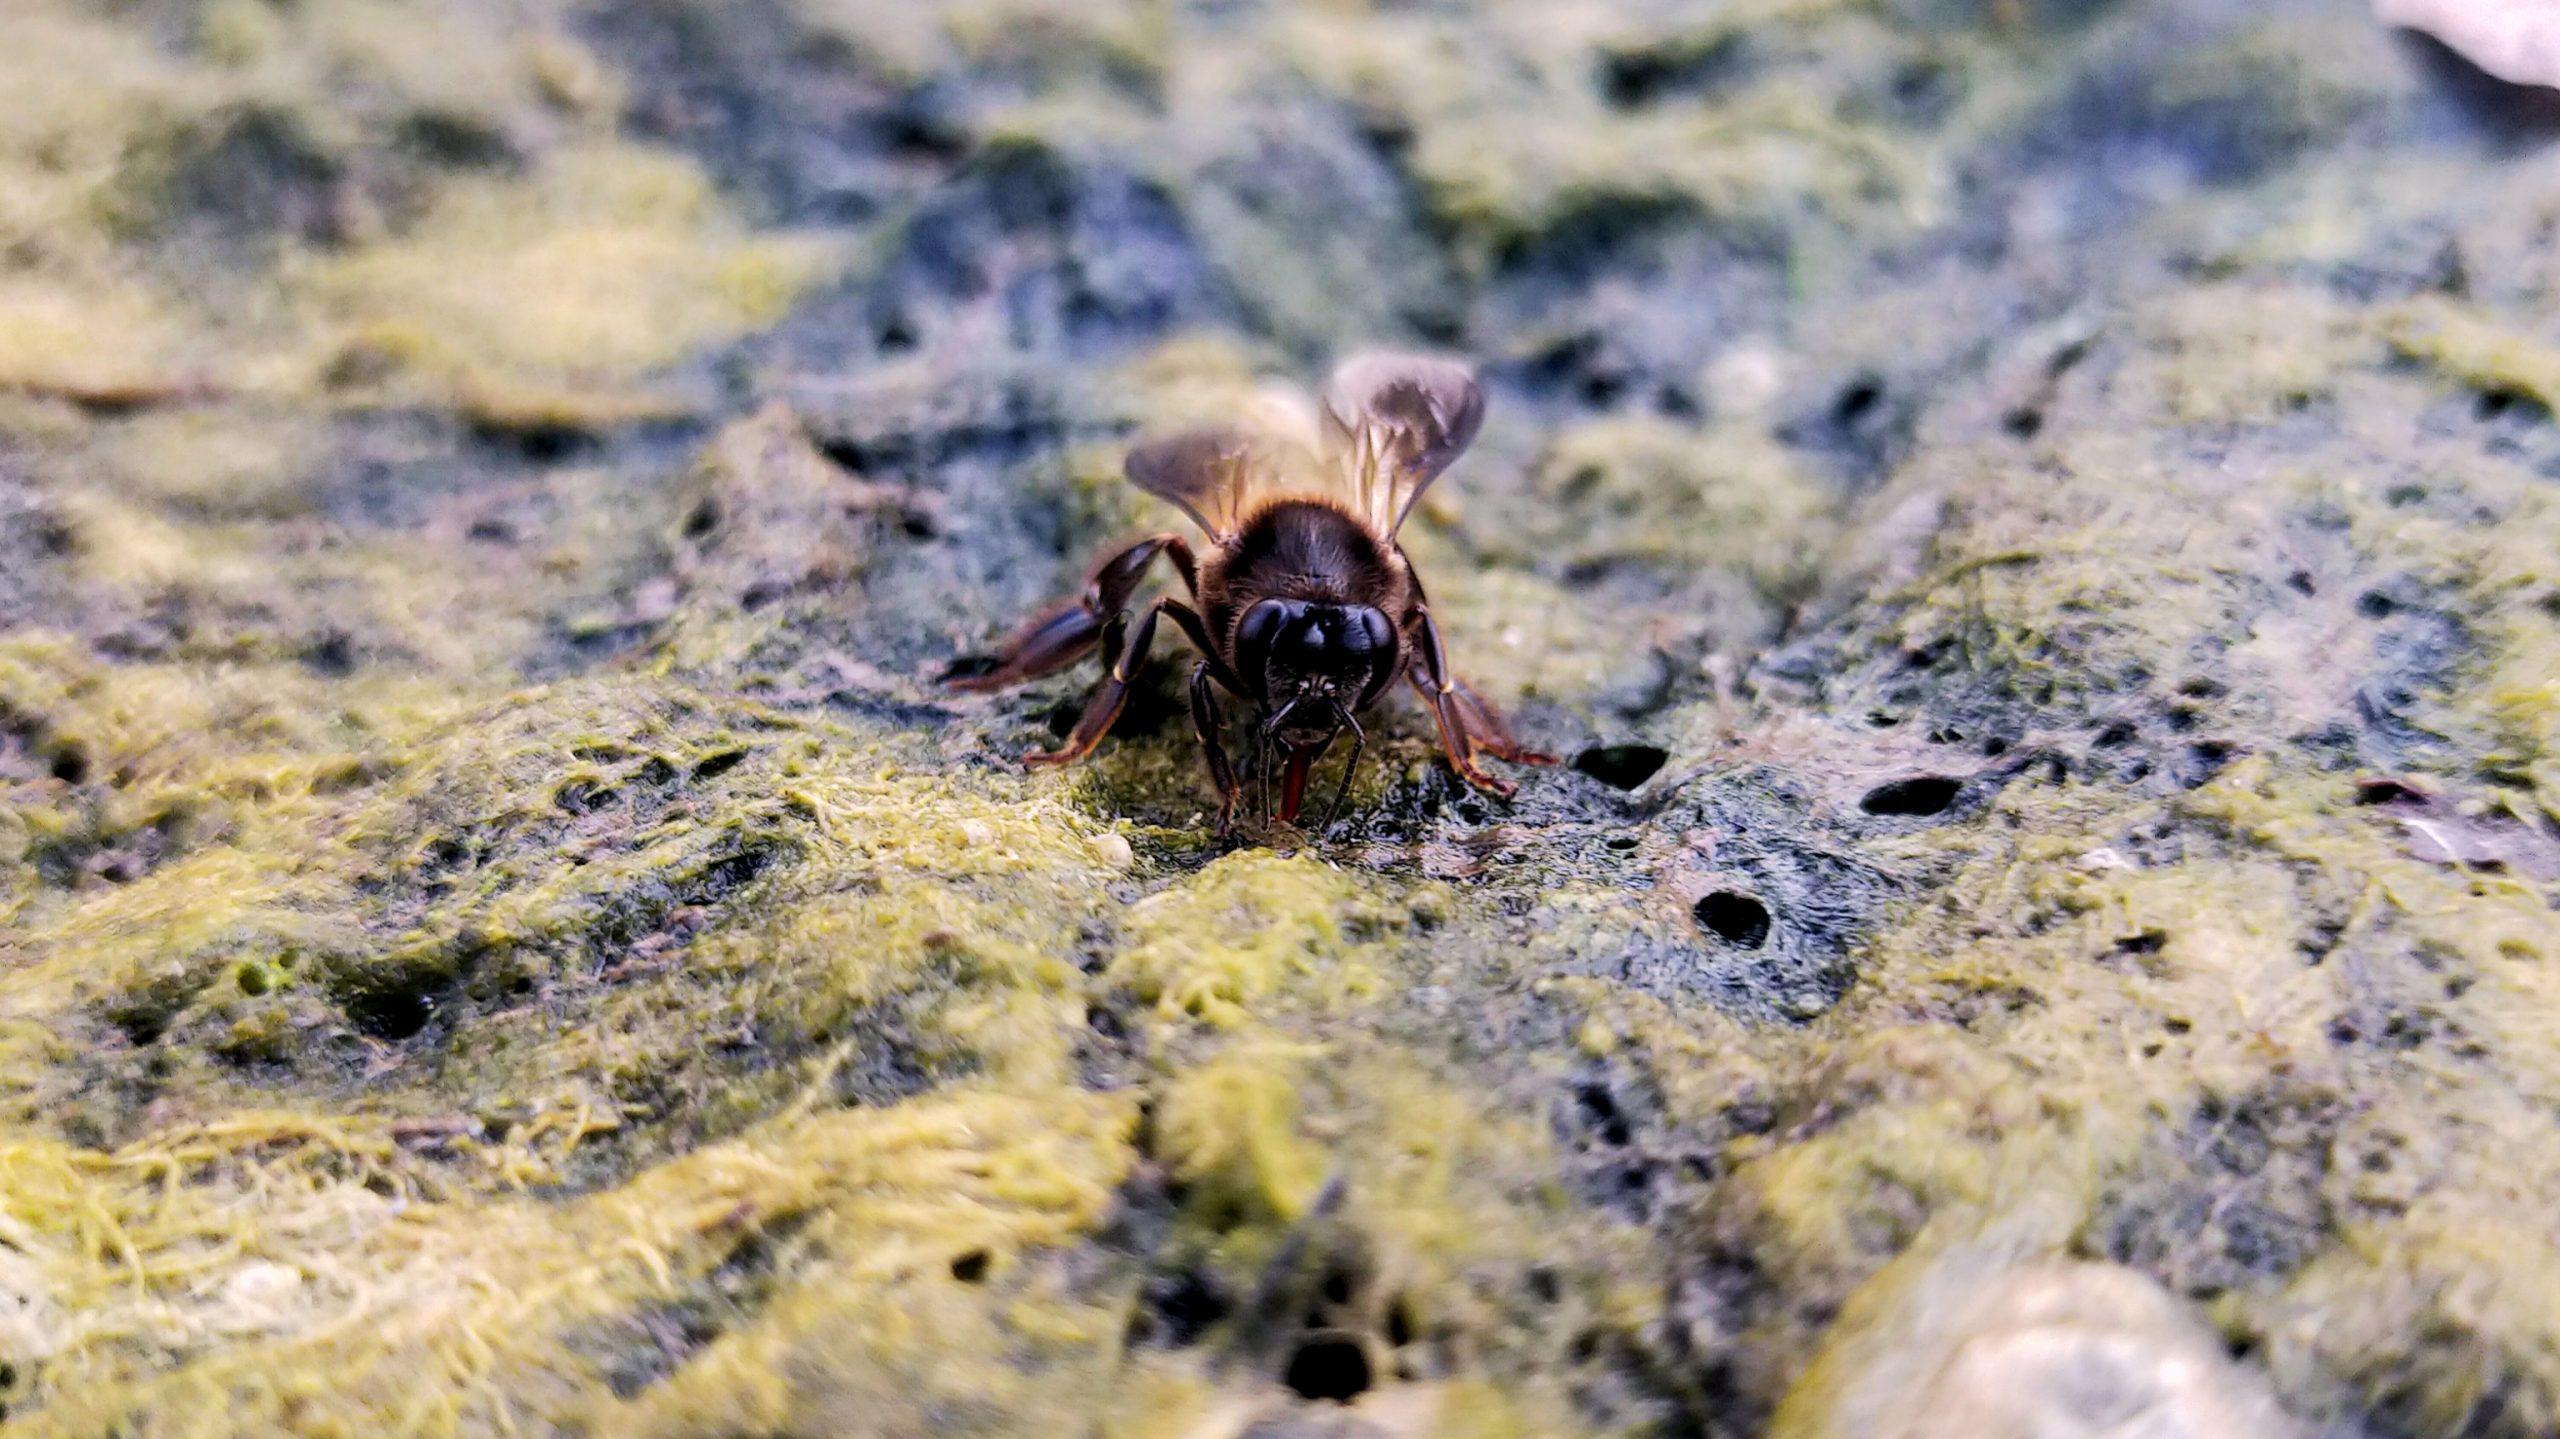 A honeybee sitting on algae